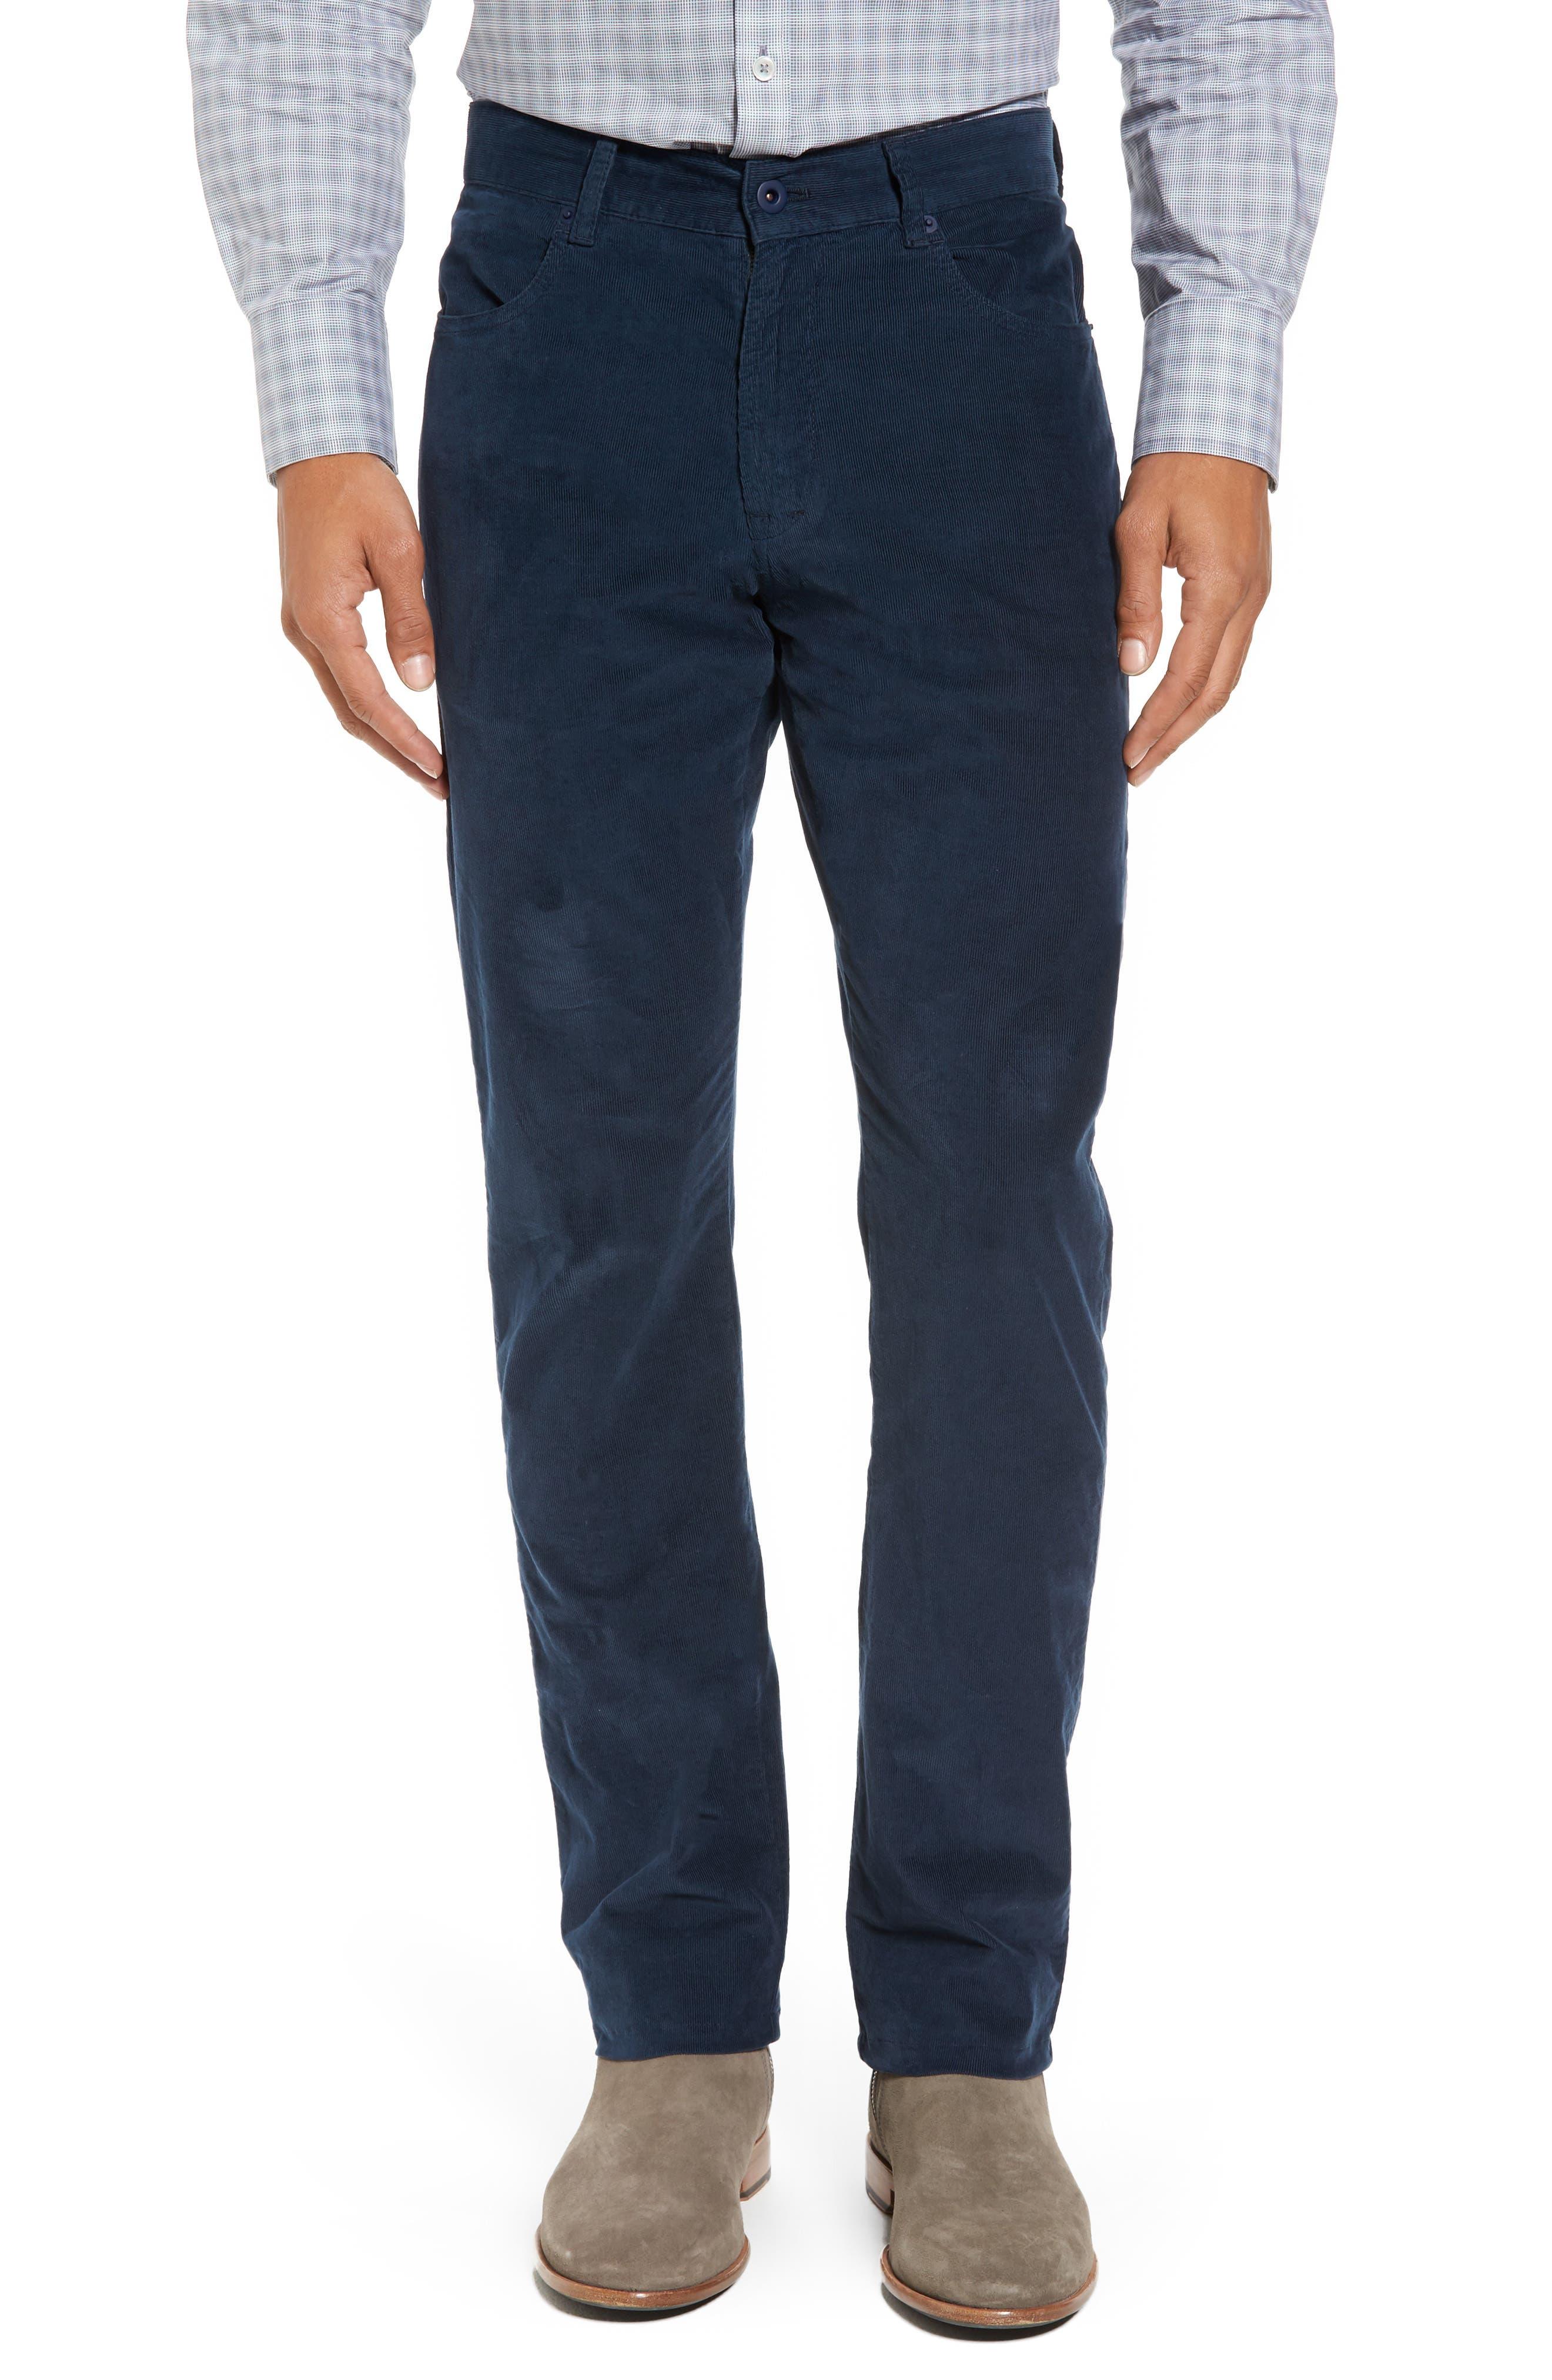 Redonda Stretch Corduroy Trousers,                         Main,                         color, Midnight